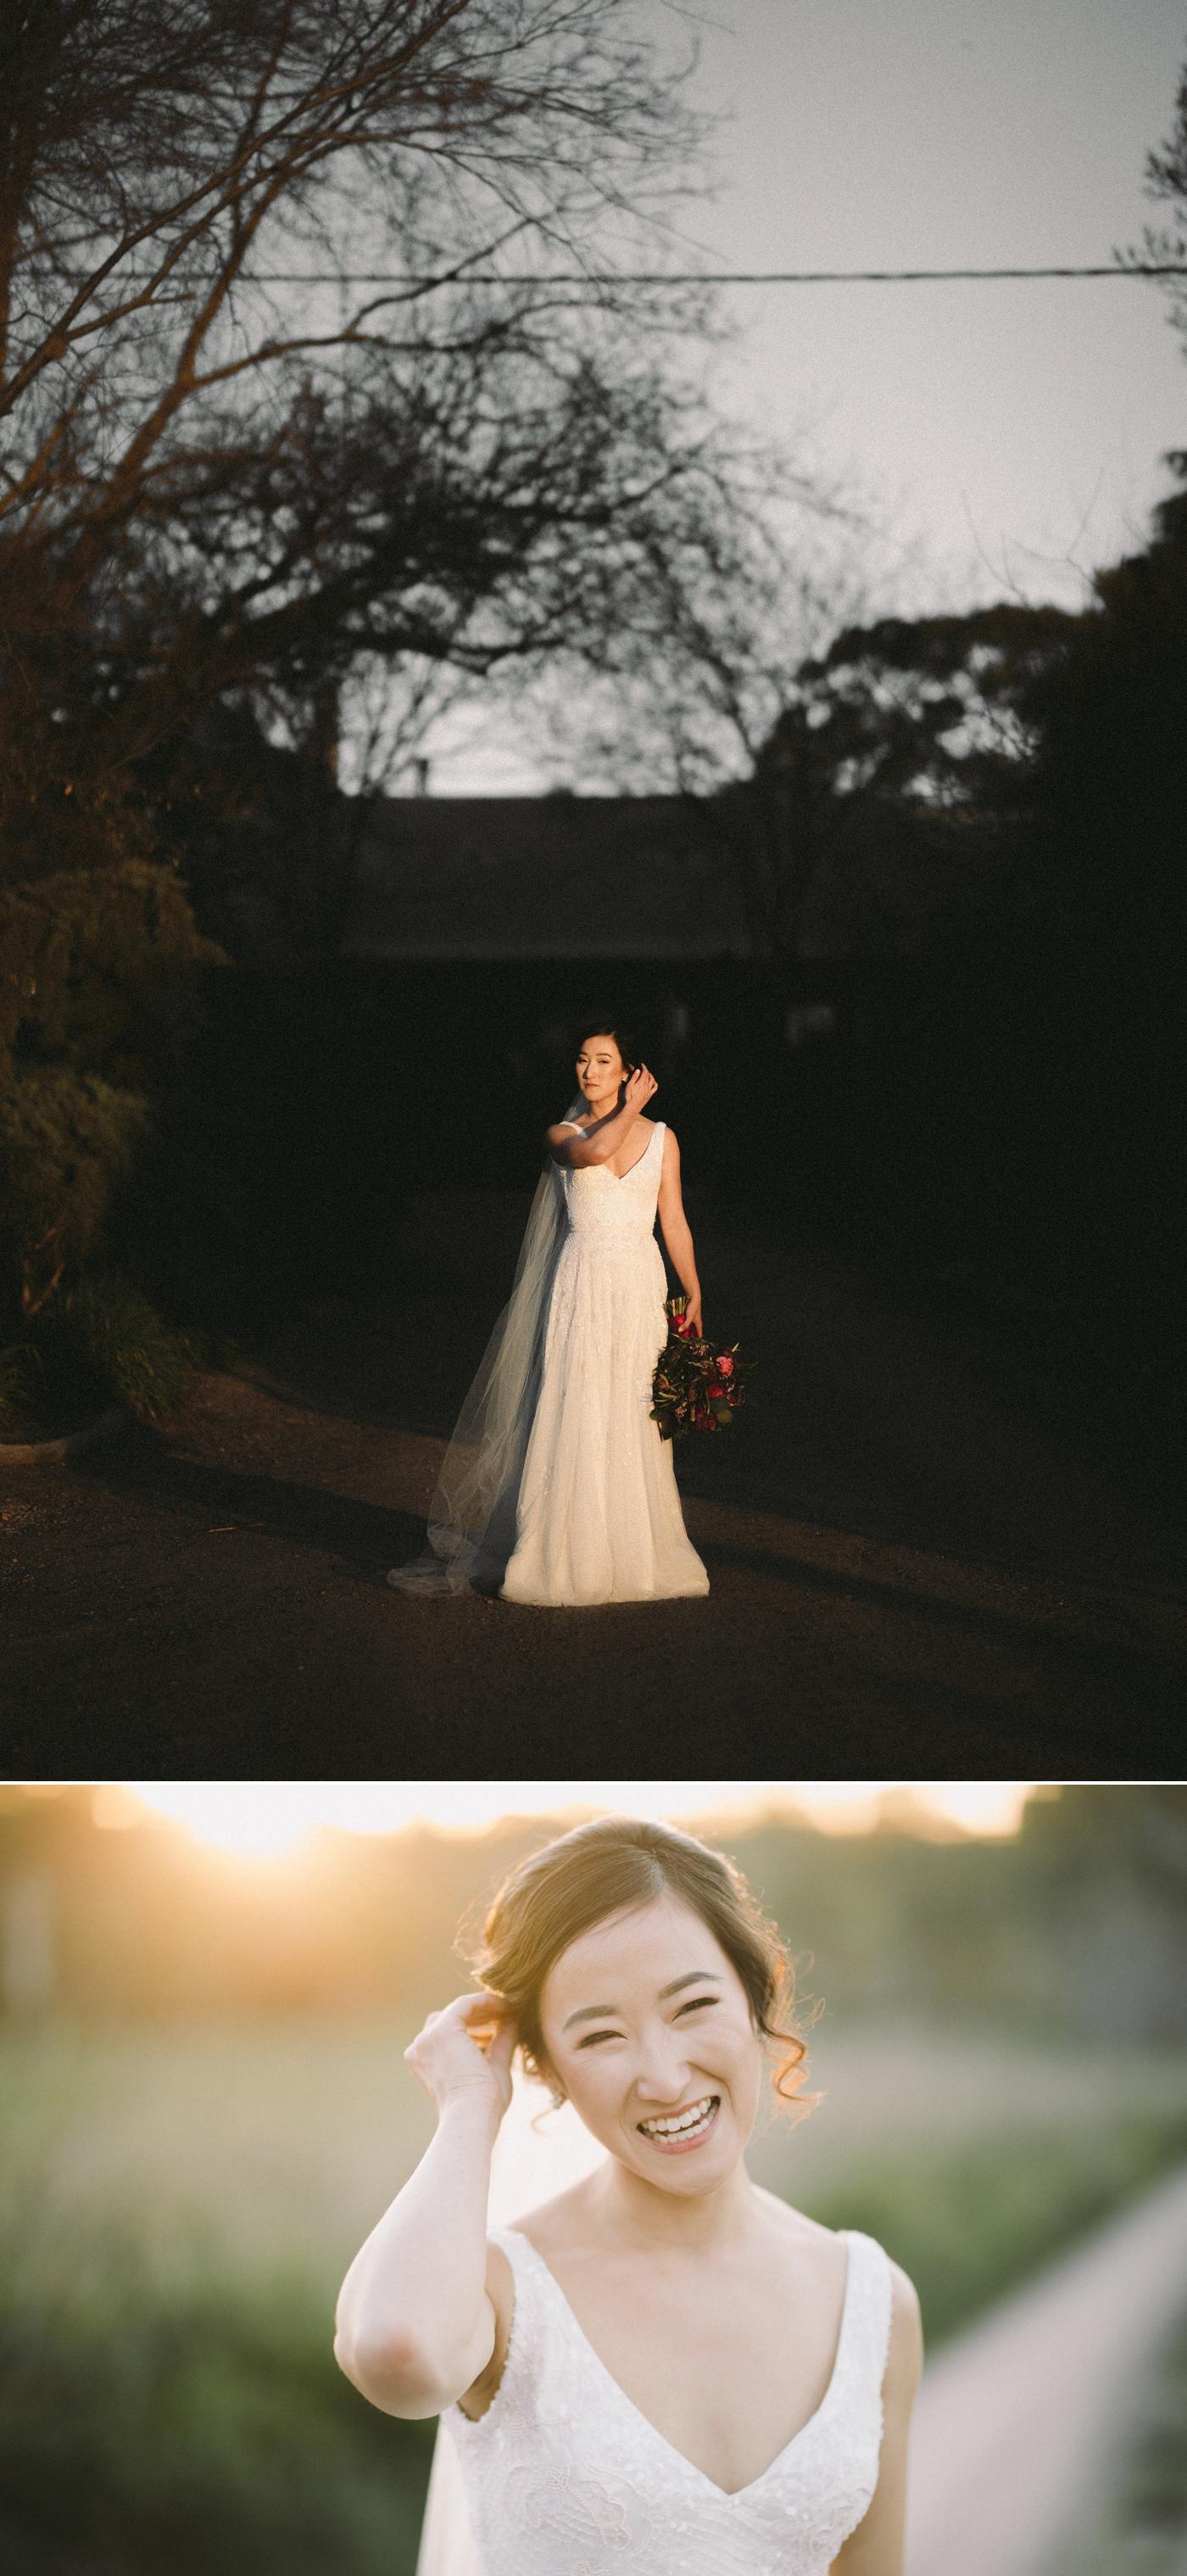 Adelaide Wedding Photographer - Al Ru Farm Wedding in Adelaide - Natural Wedding Photography Australia - www.katherineschultzphotography.com - Todd & Rachel_0051.jpg